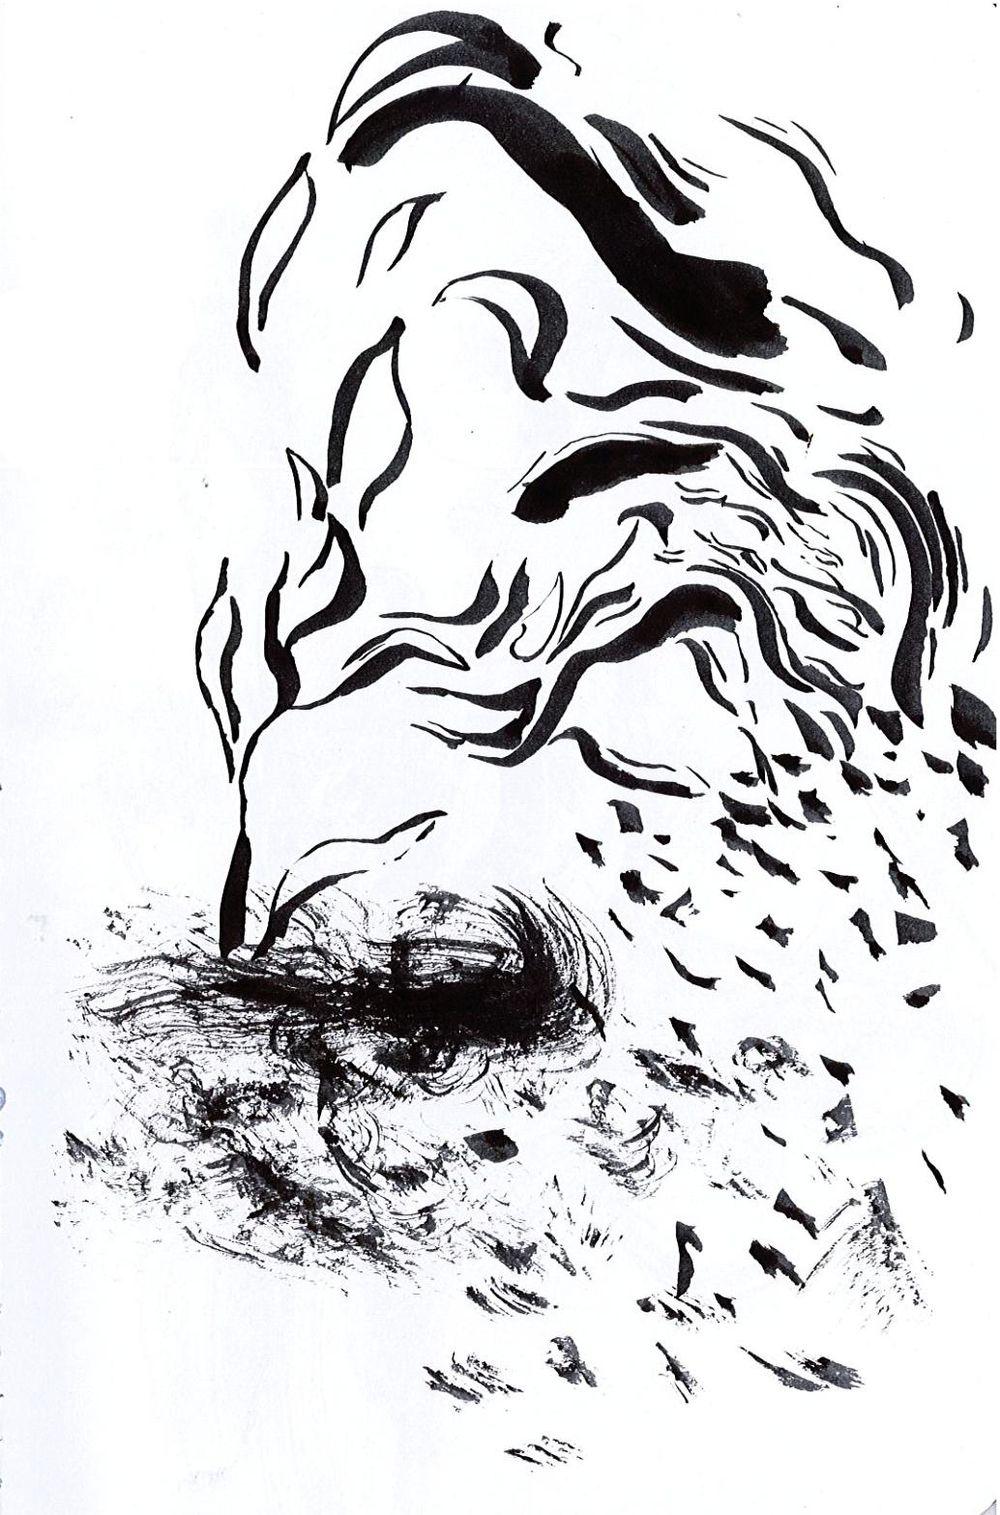 Fearless Art Jumpstart - image 5 - student project